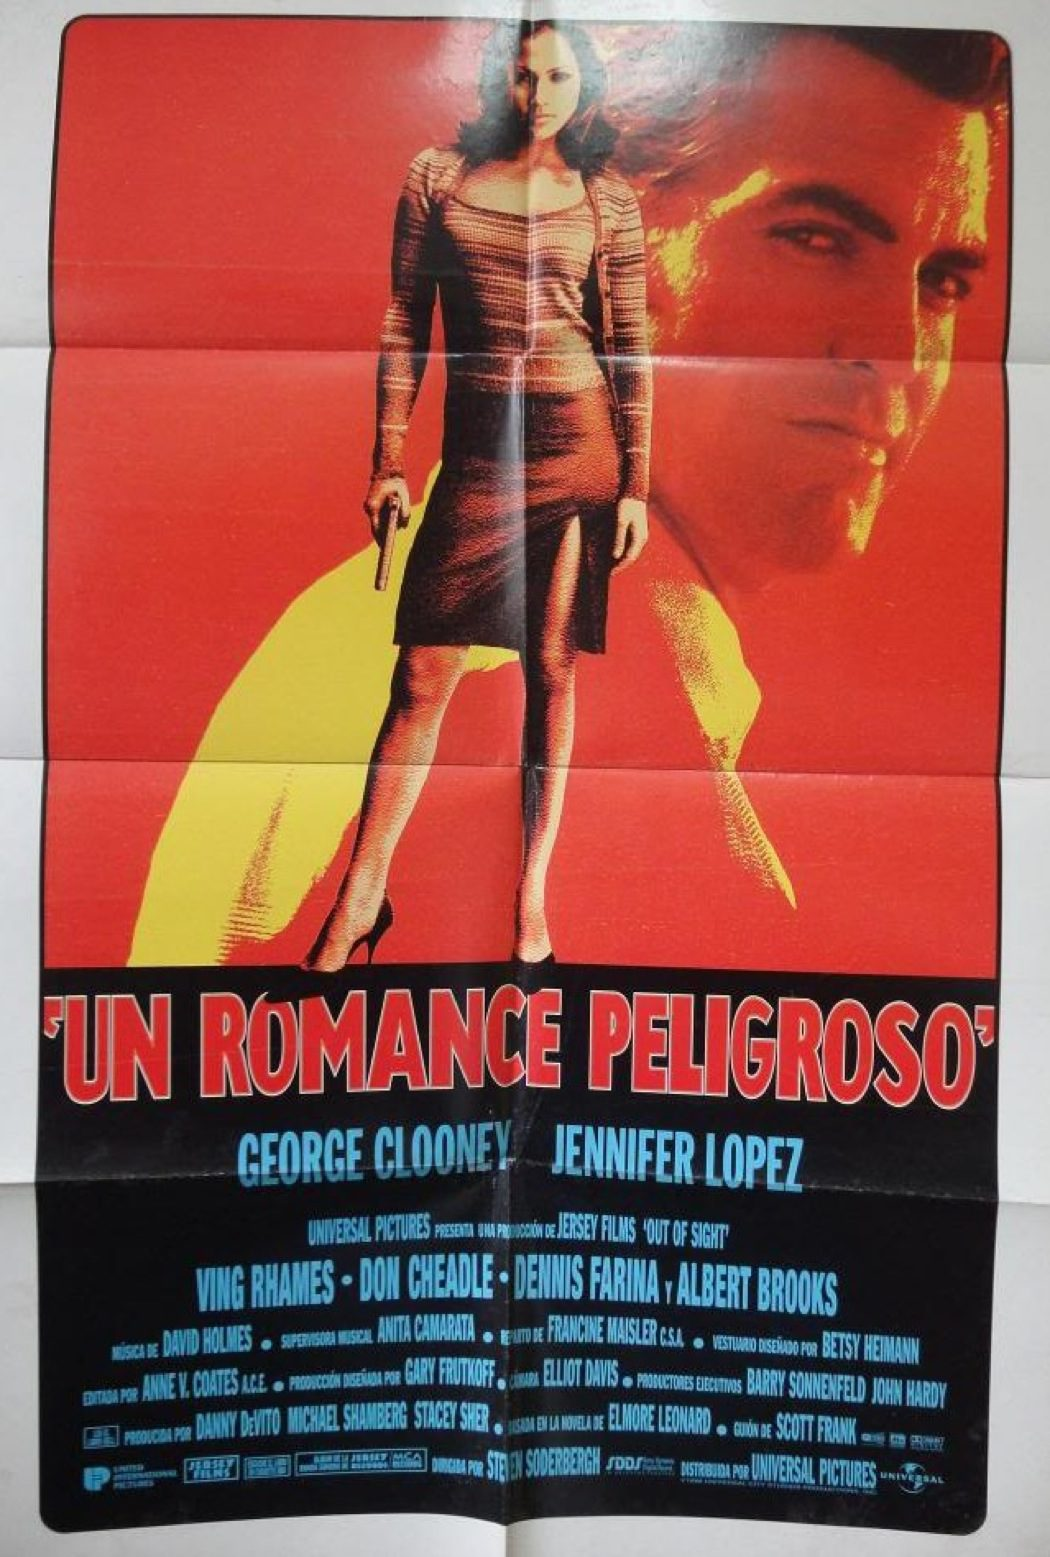 'Un romance muy peligroso'